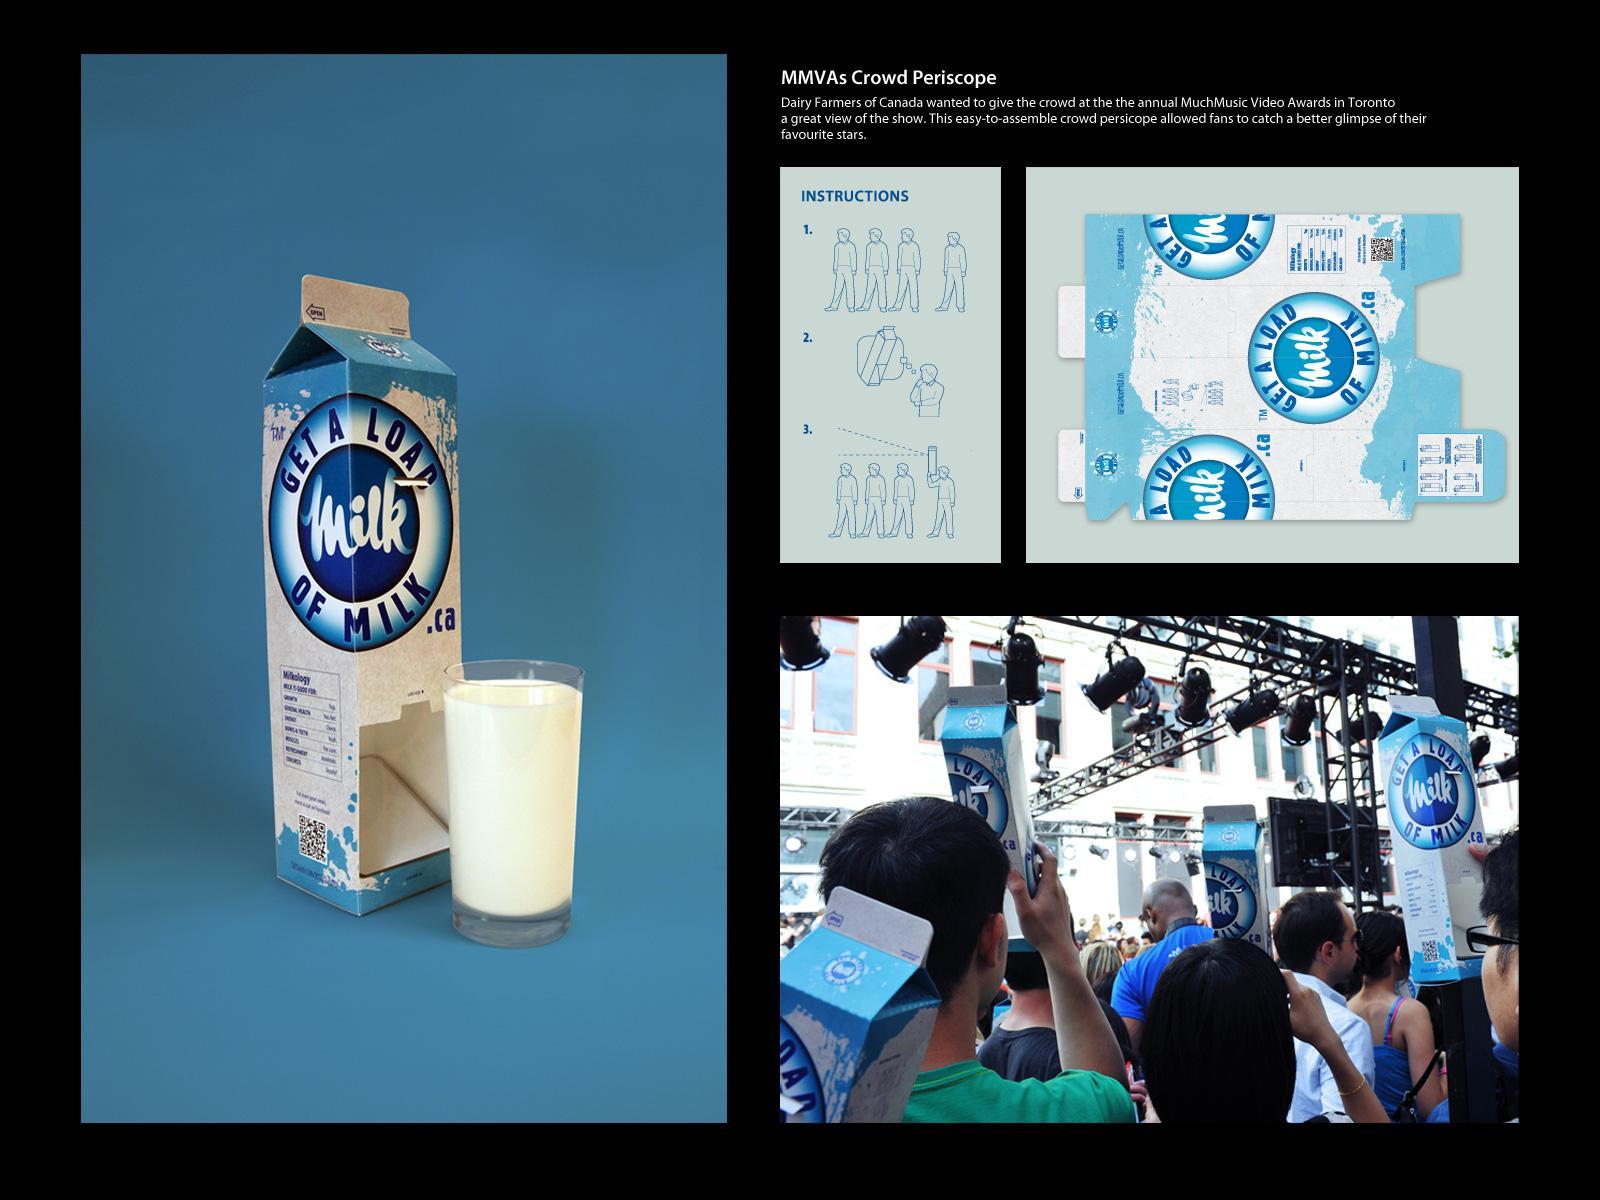 Dairy Farmers of Canada Direct Ad -  MMVAs Crowd Periscope